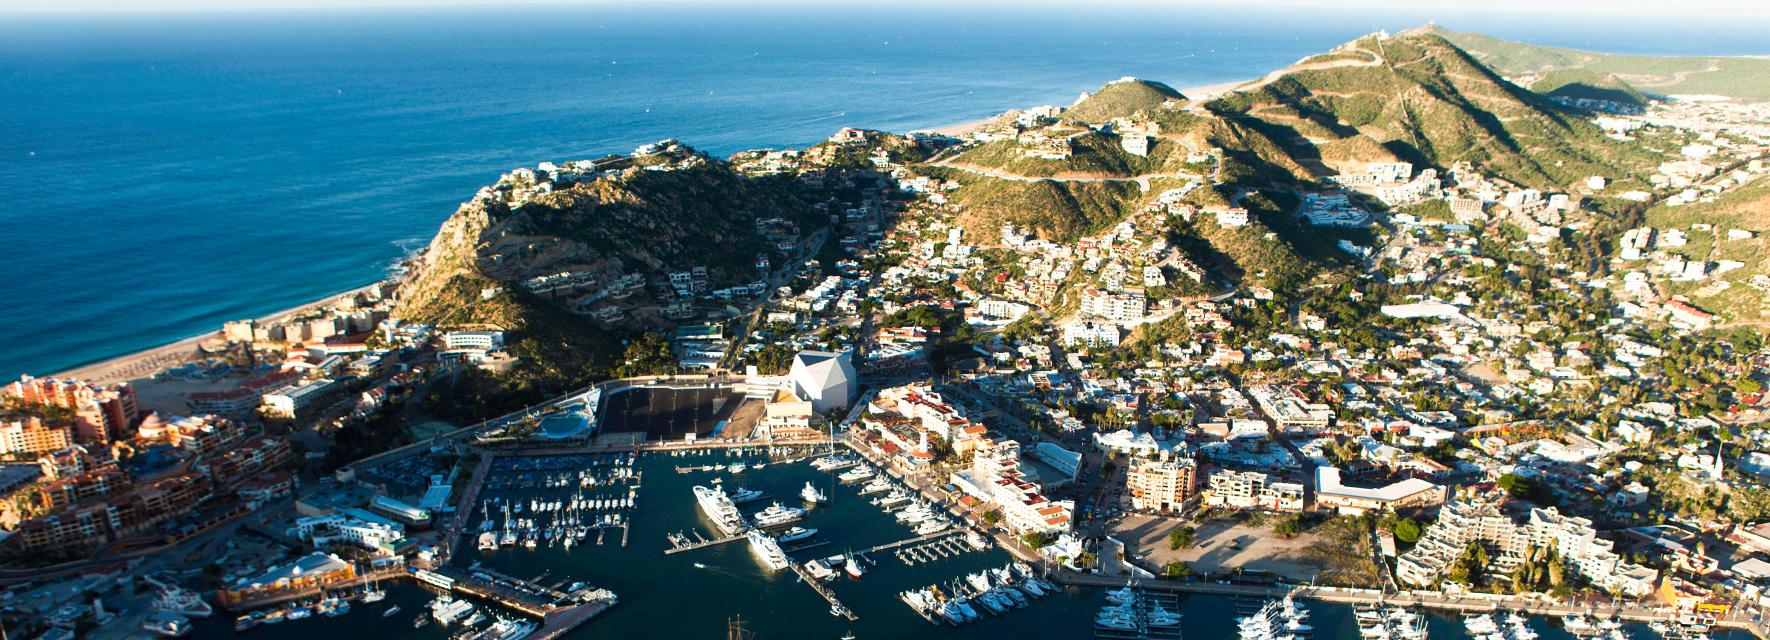 Big Lots Financing >> Owner Financing on all Developer`s Pedregal LotsVanSirius Real Estate – Los Cabos Luxury Real Estate